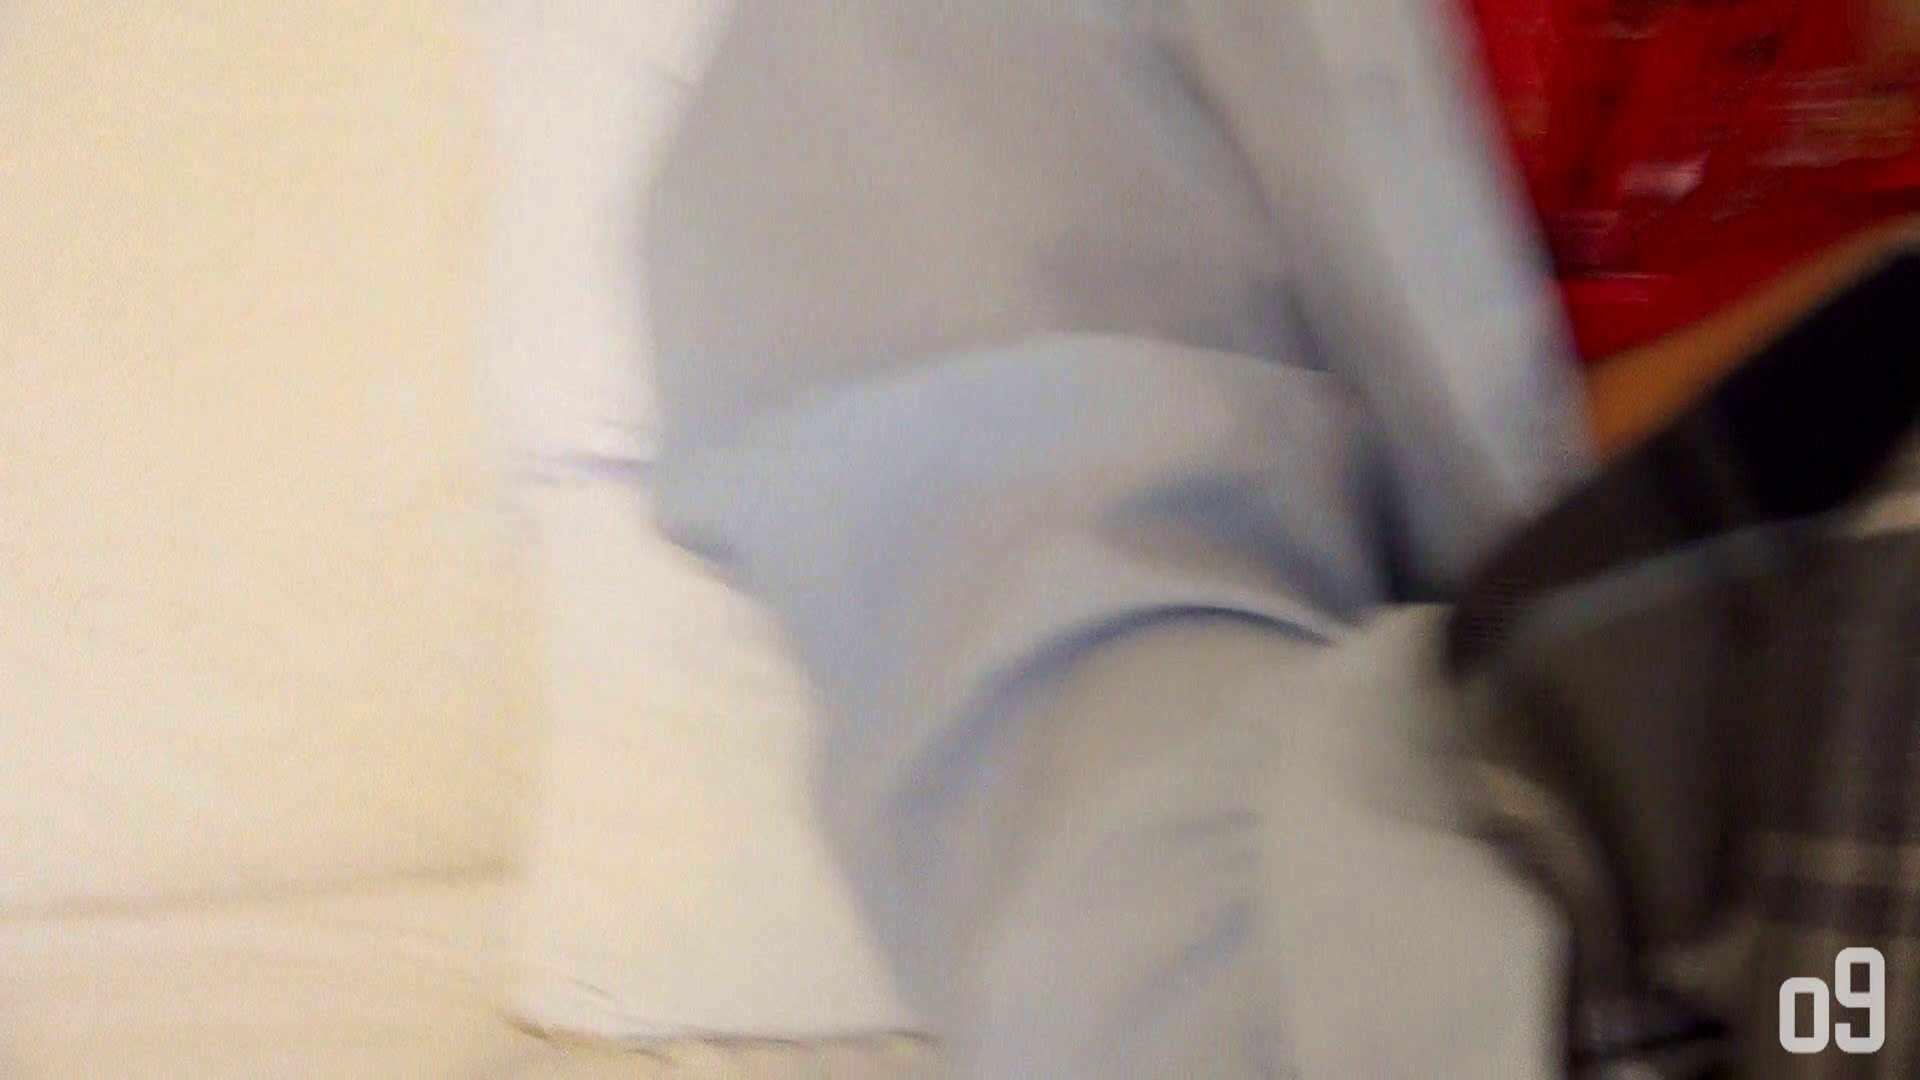 vol.6 TKSさんが震える!留華ちゃんの不慣れな手コキで念願の射精! 顔出しNG一般女性 | エッチなOL  99pic 1